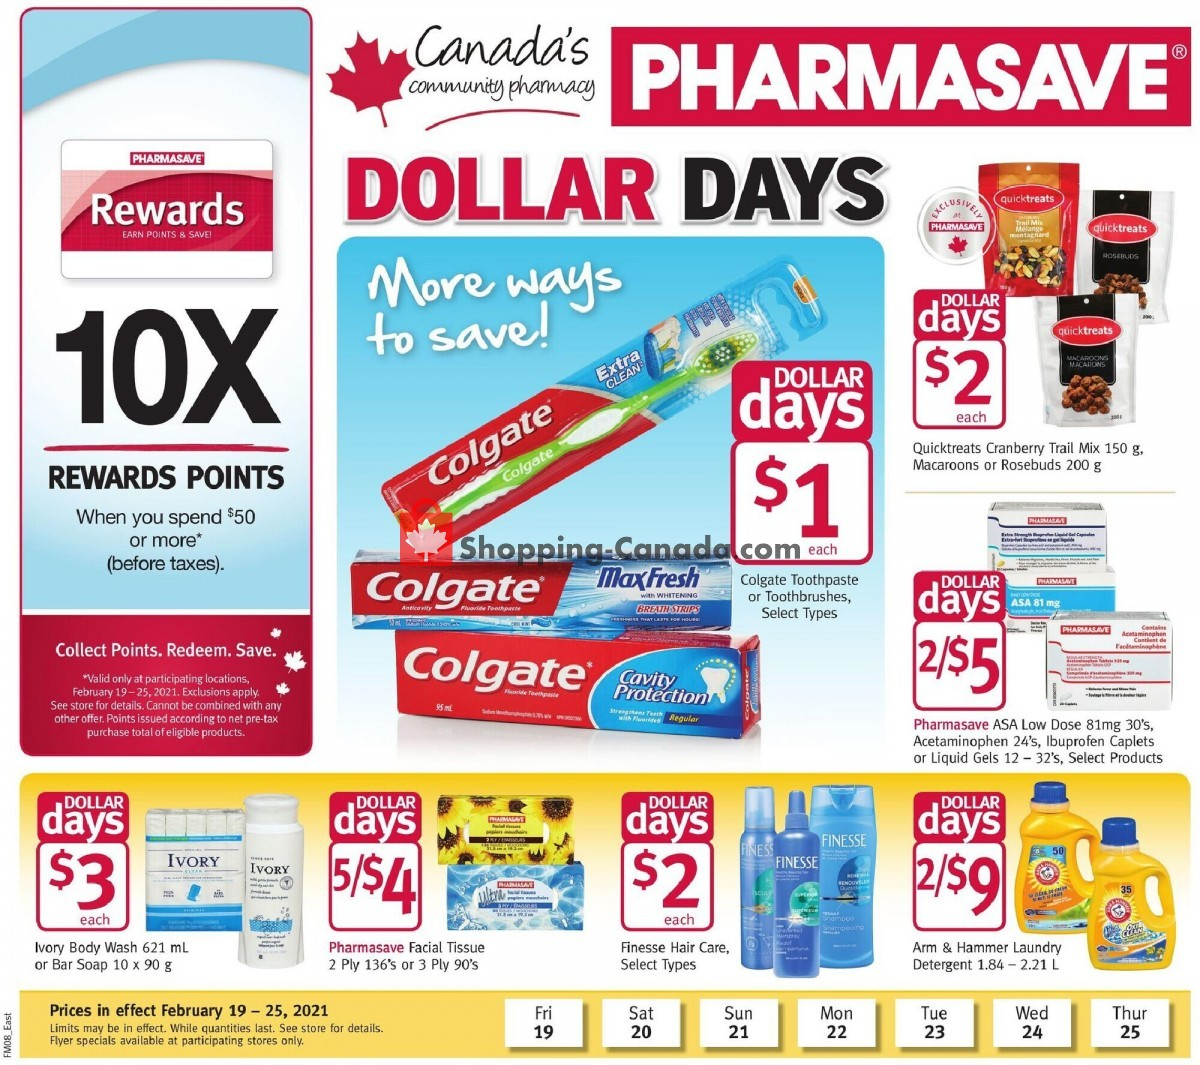 Flyer Pharmasave Canada - from Friday February 19, 2021 to Thursday February 25, 2021